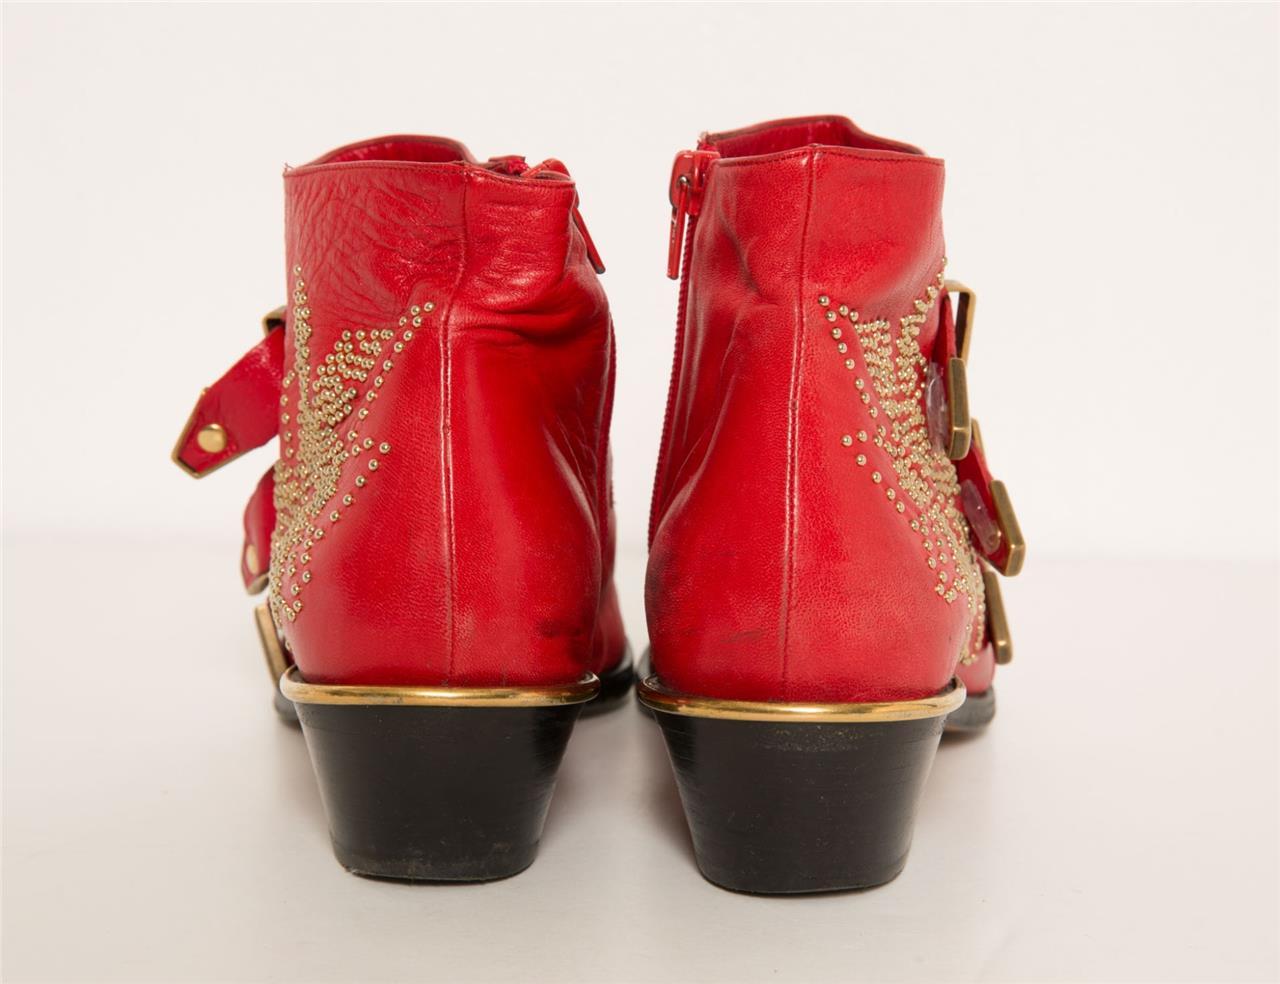 Chloe Femmes Cuir Rouge Susanna or Studed Bout Pointu Bottines 7.5 ... d4a70860c2e